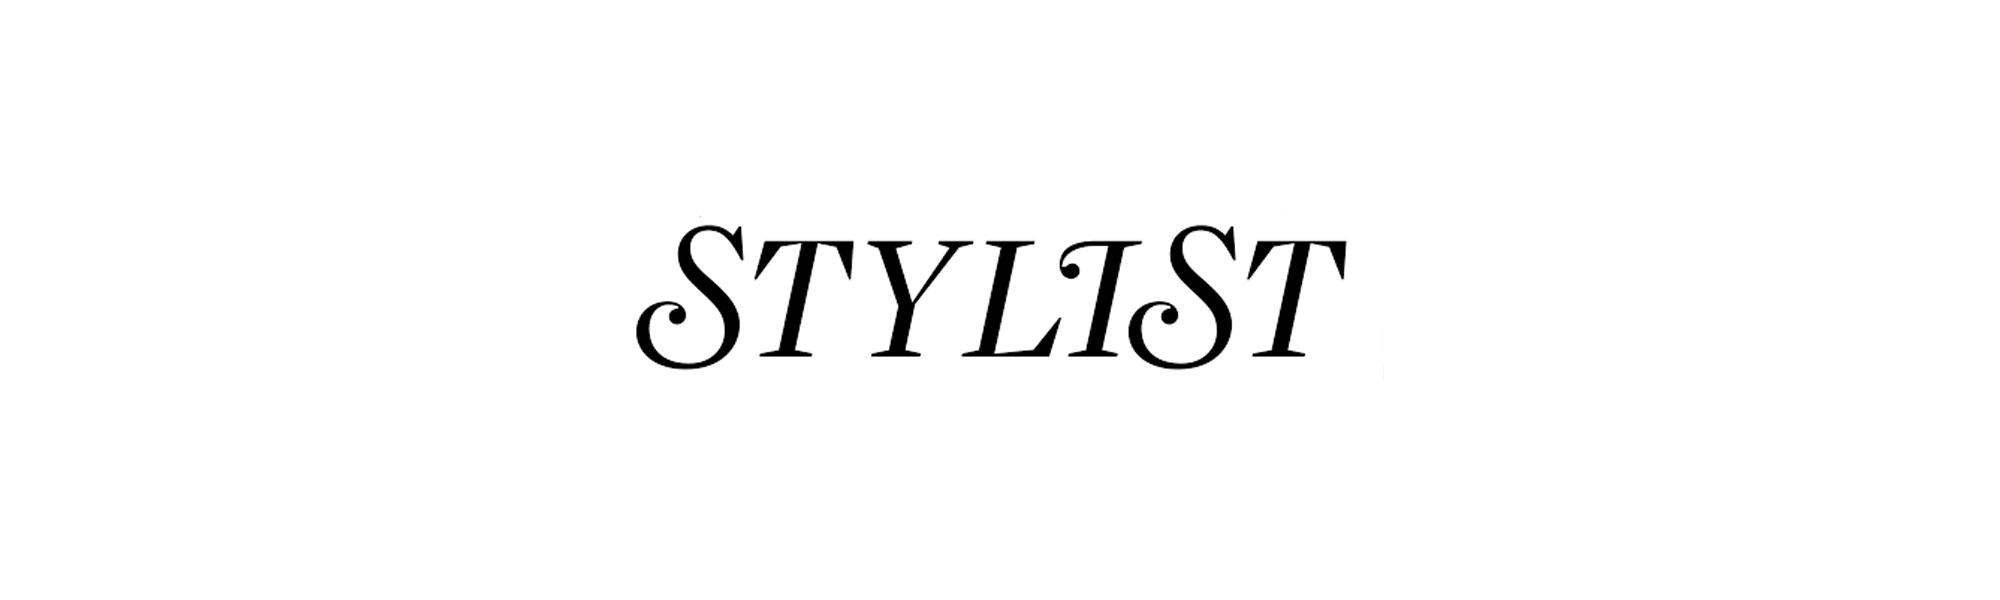 Stylist …more